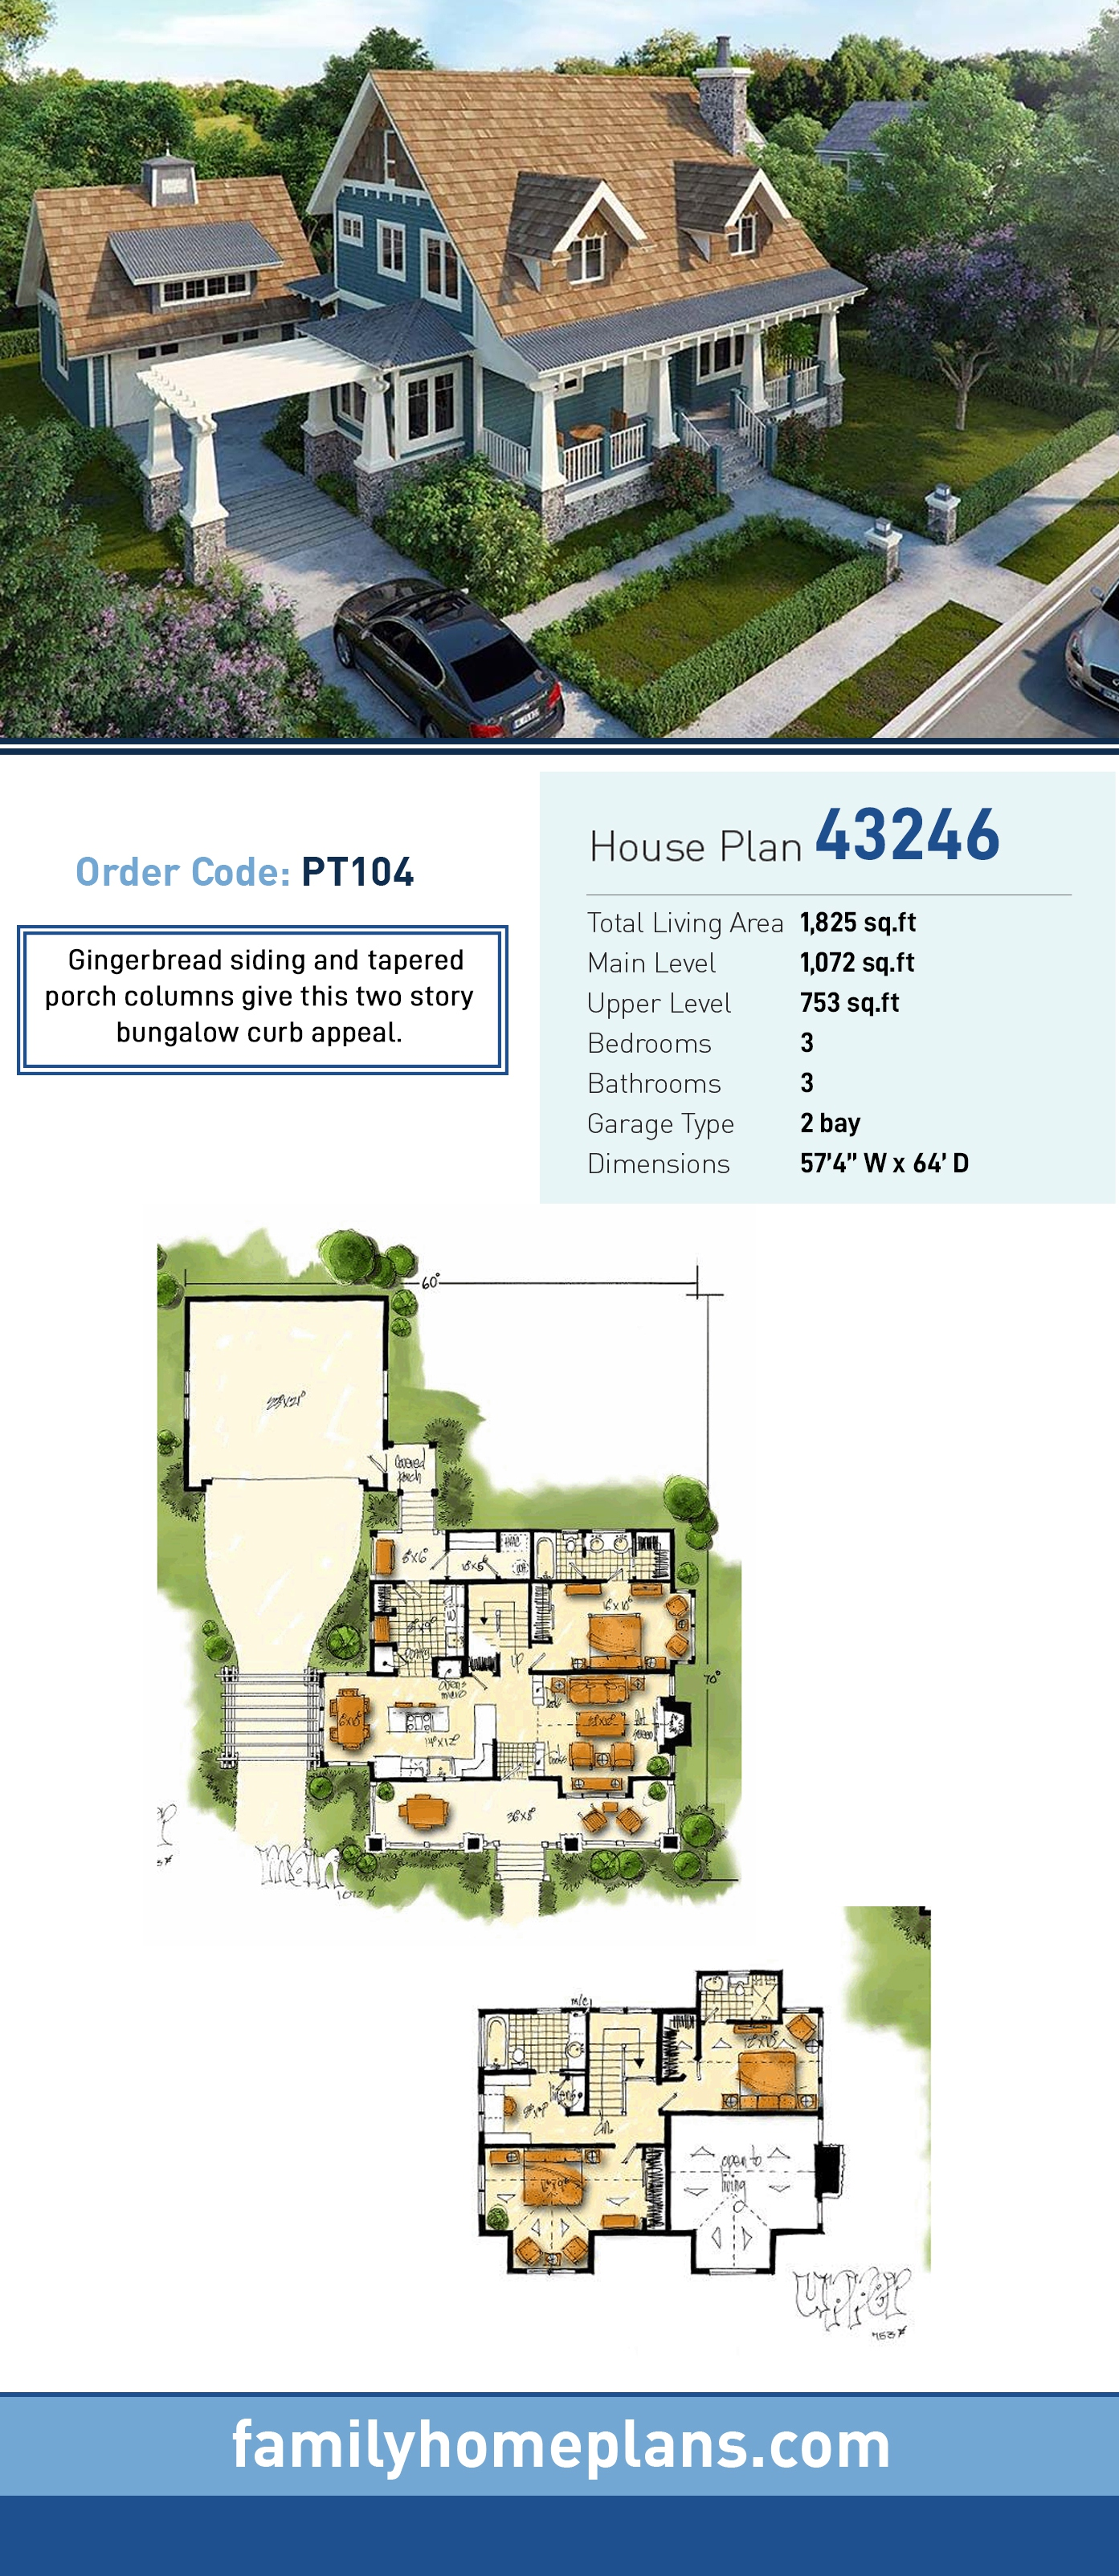 Bungalow , Cottage , Craftsman House Plan 43246 with 3 Beds, 3 Baths, 2 Car Garage